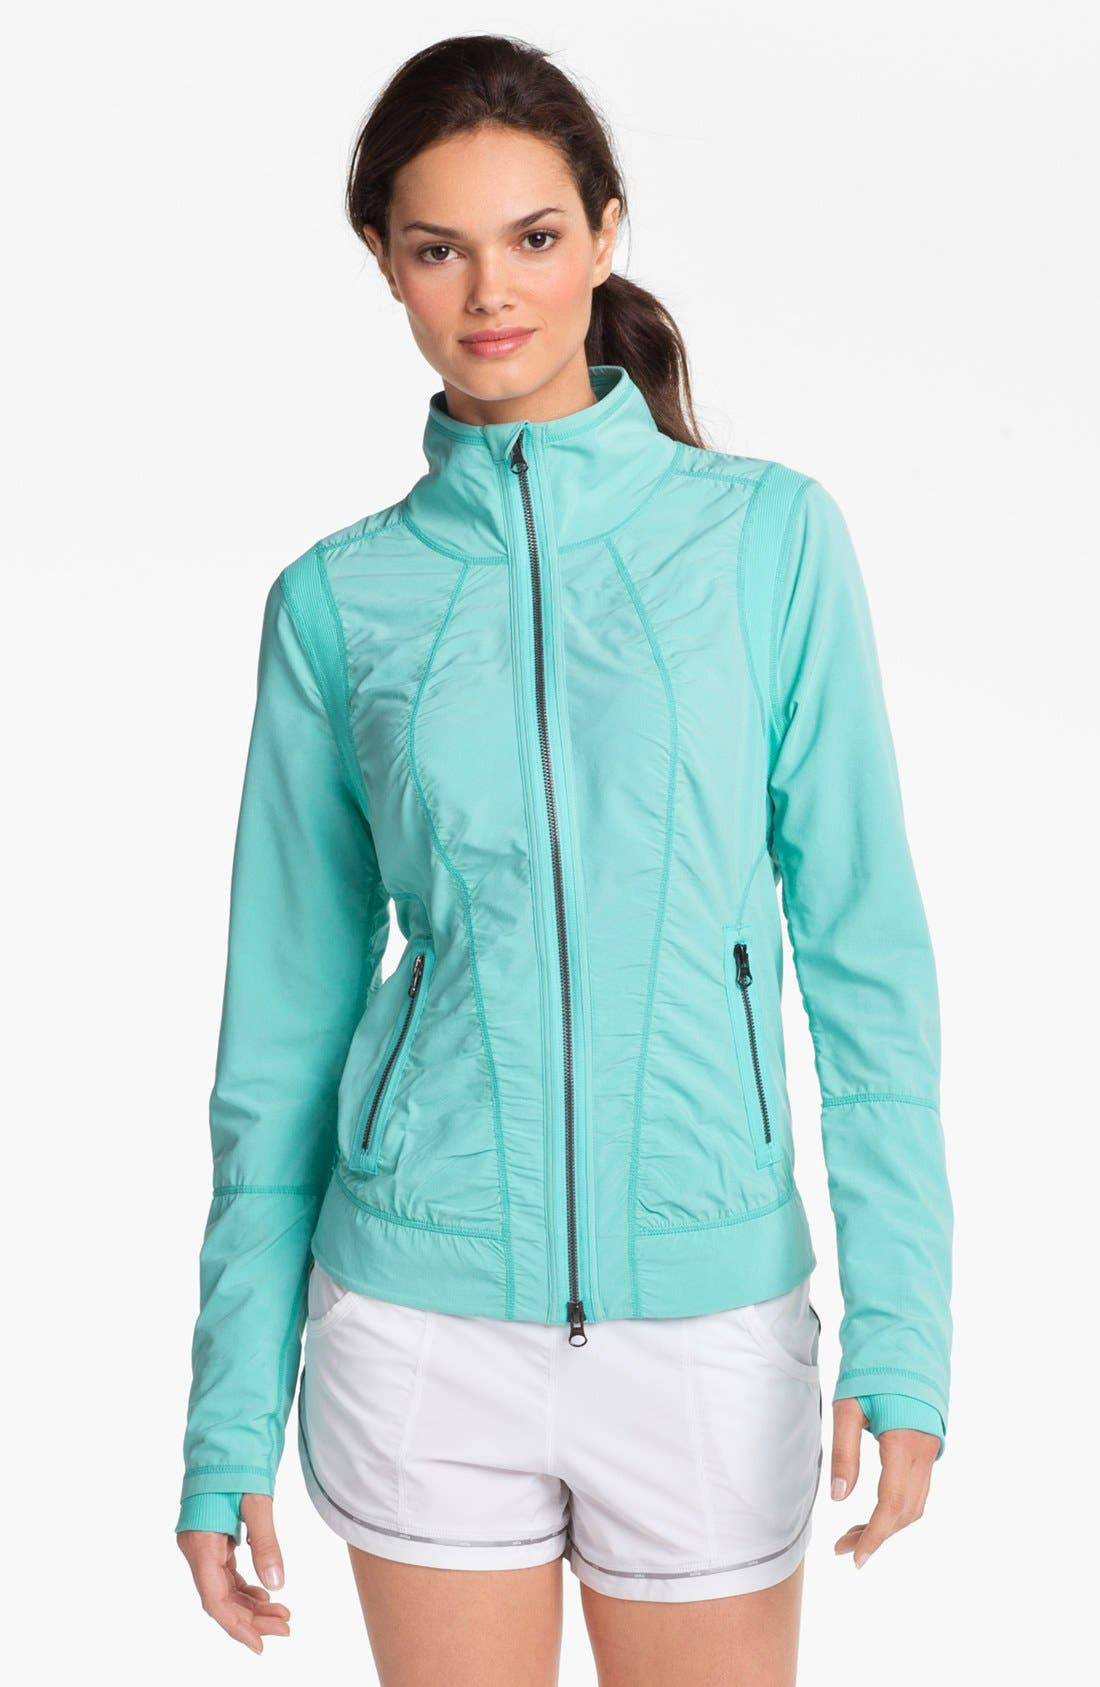 Main Image - Zella 'Natalie' Running Jacket